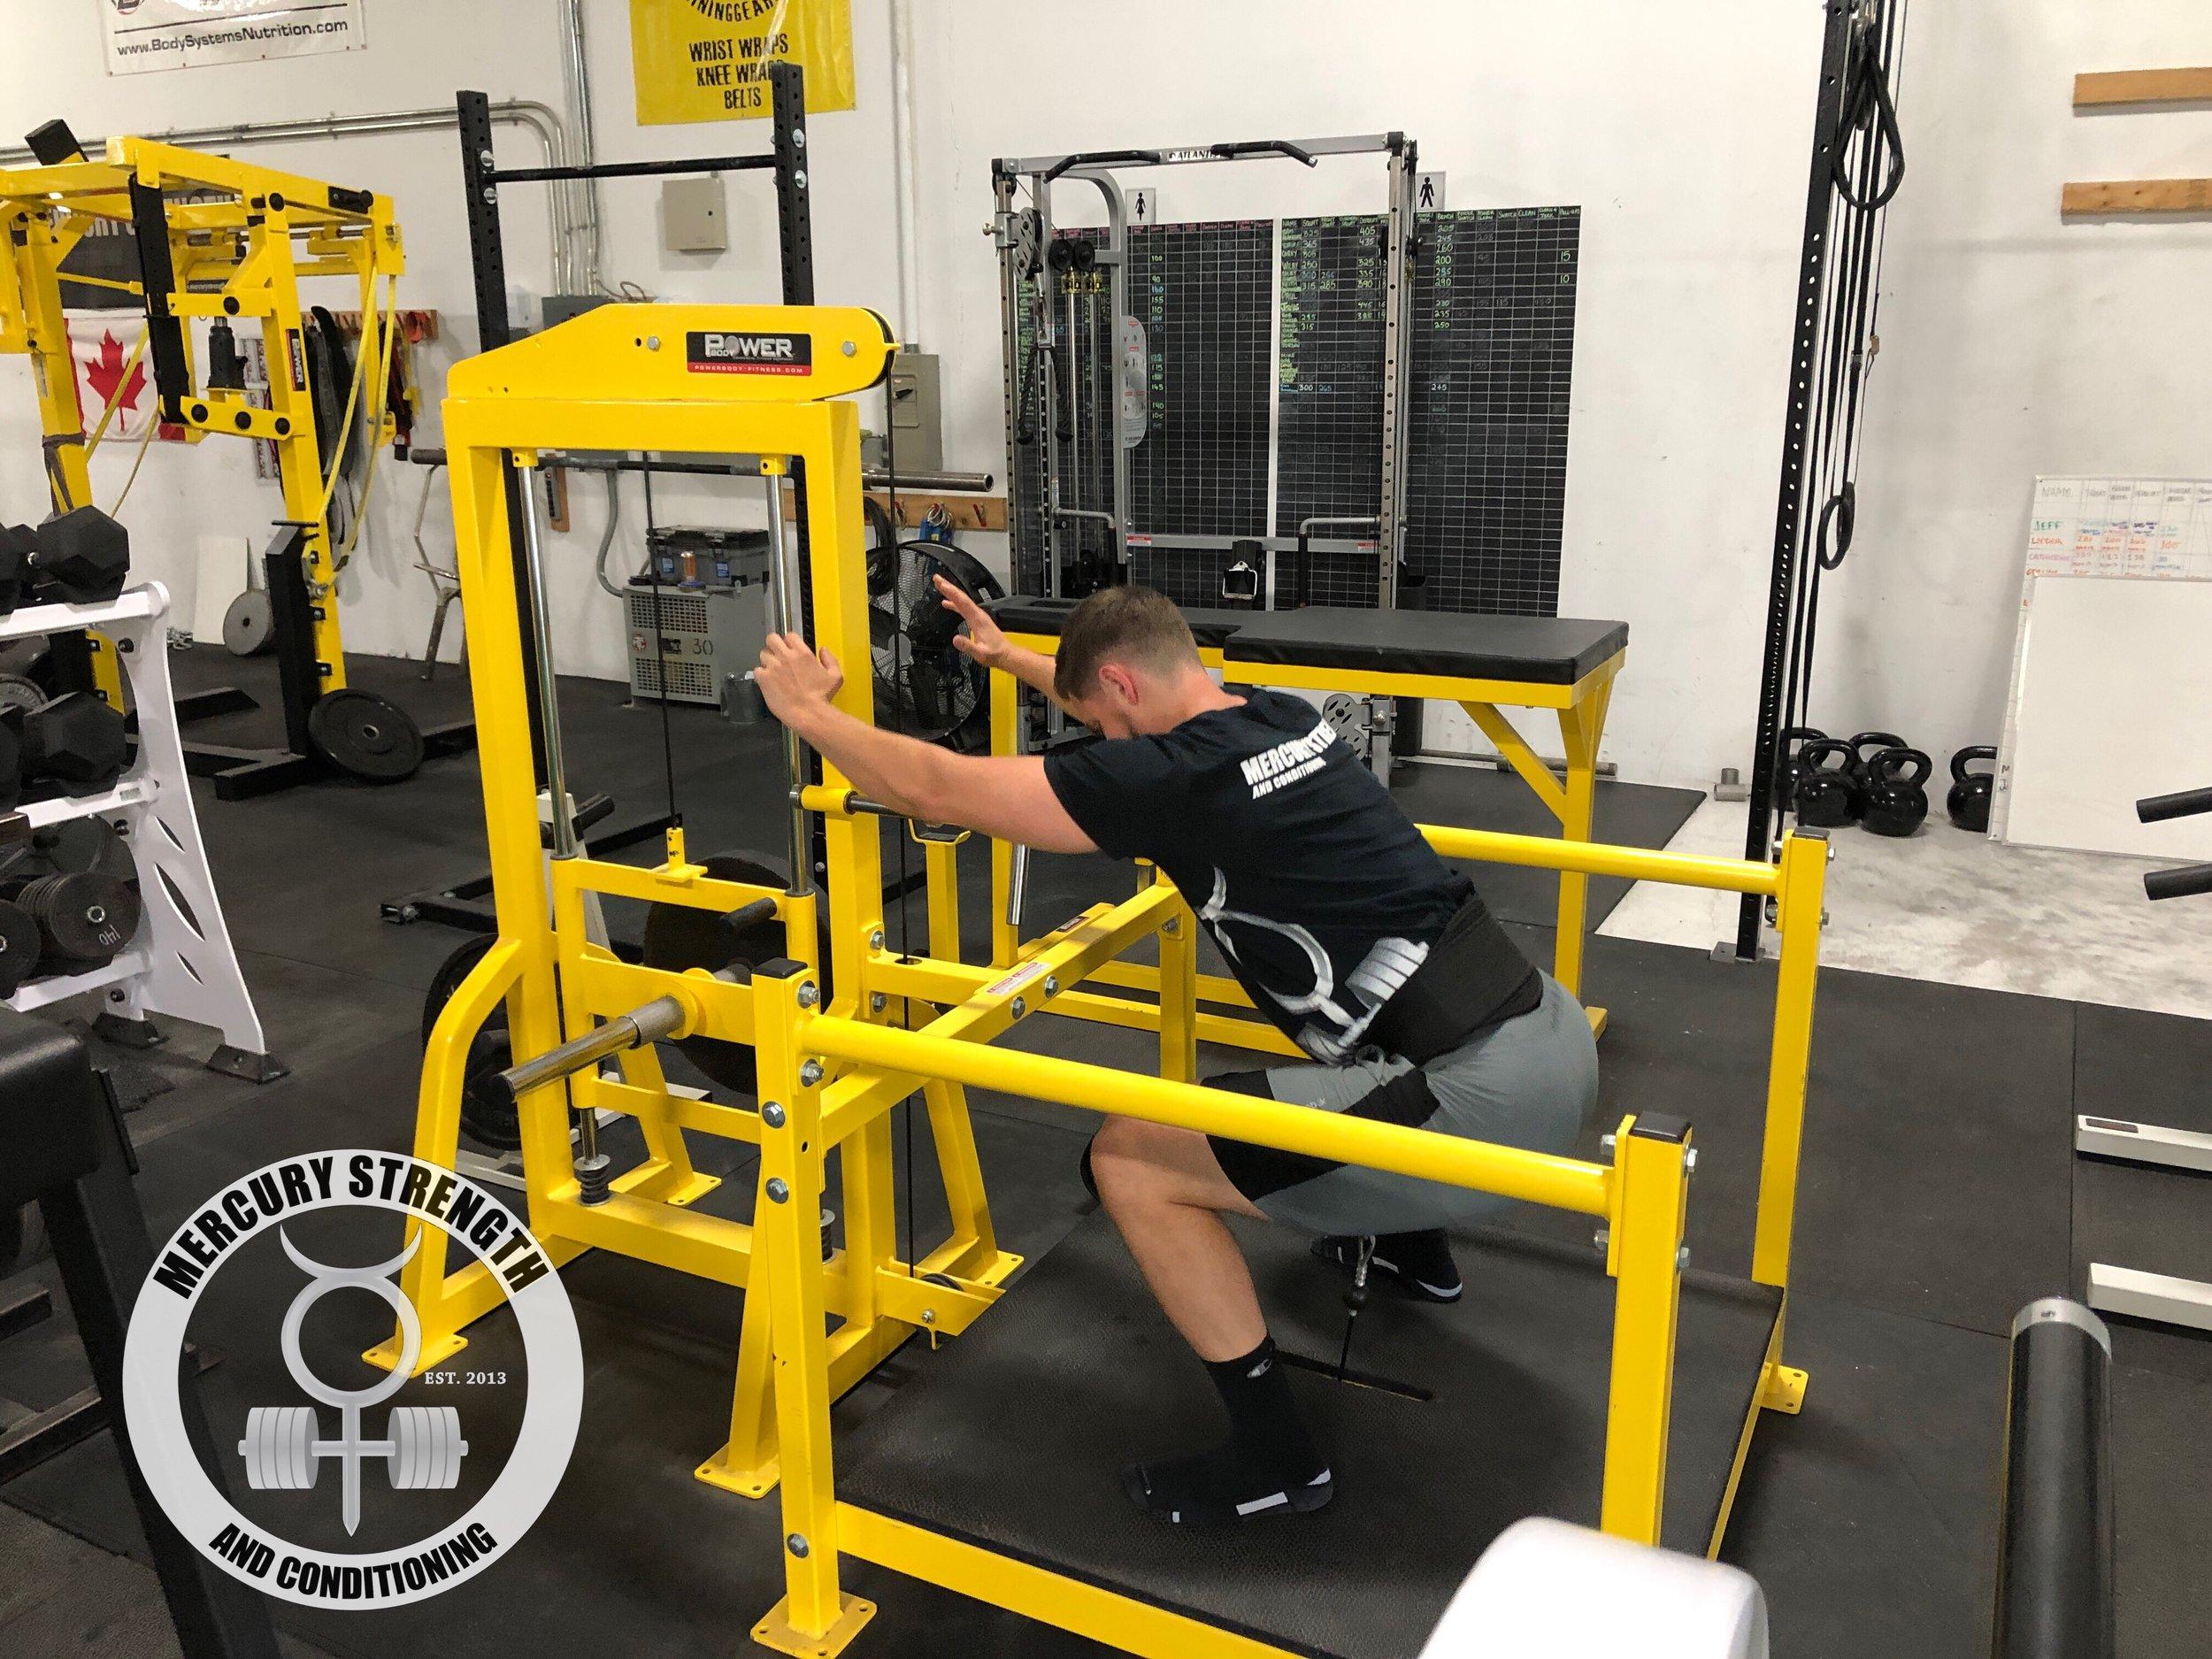 Dr. Elliott Perkins working on some accessory stuff using the belt squat machine.